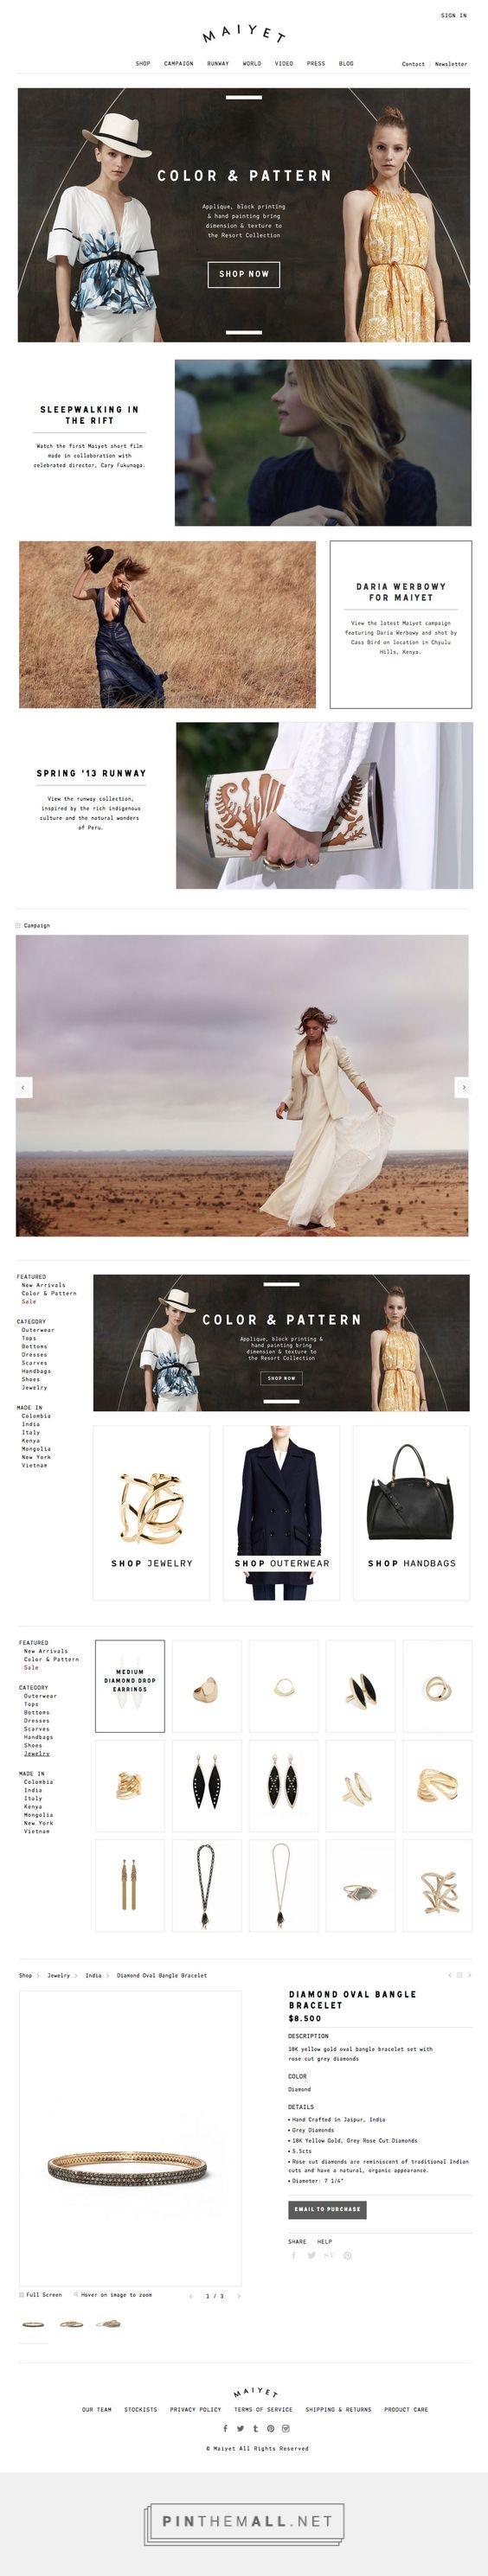 Maiyet Fashion Web Design Fivestar Branding